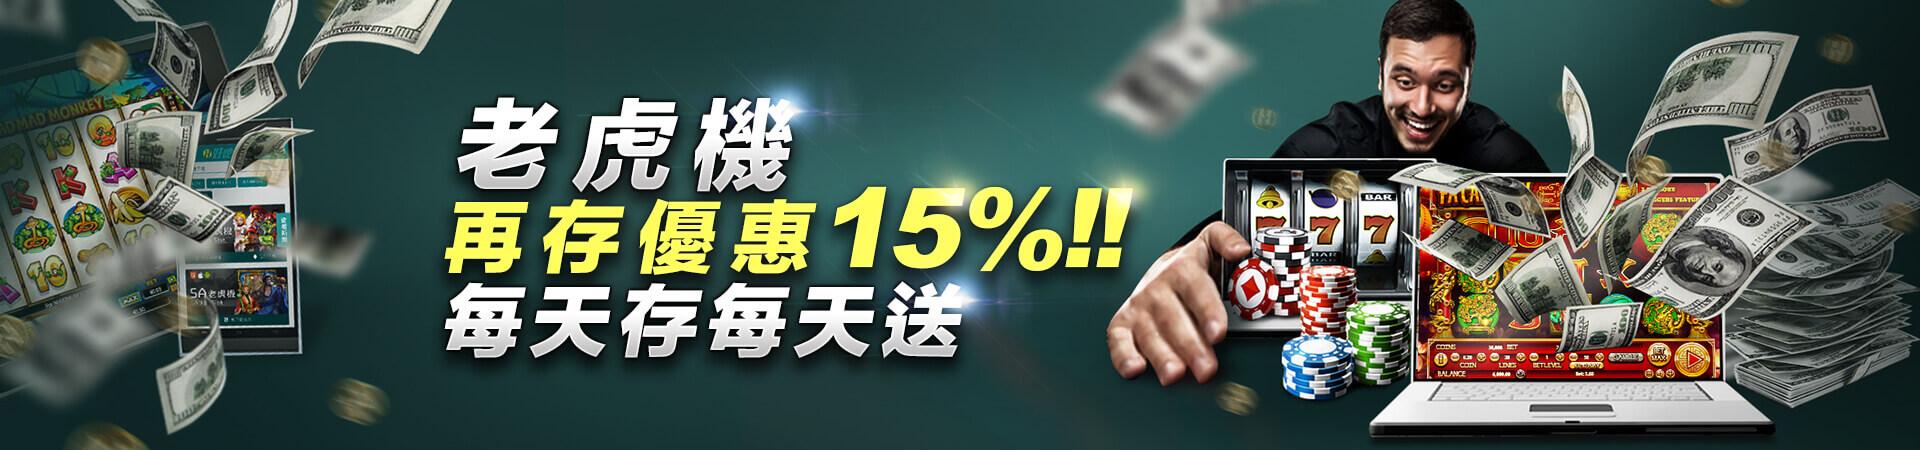 Q8娛樂城老虎機再存送15%!!